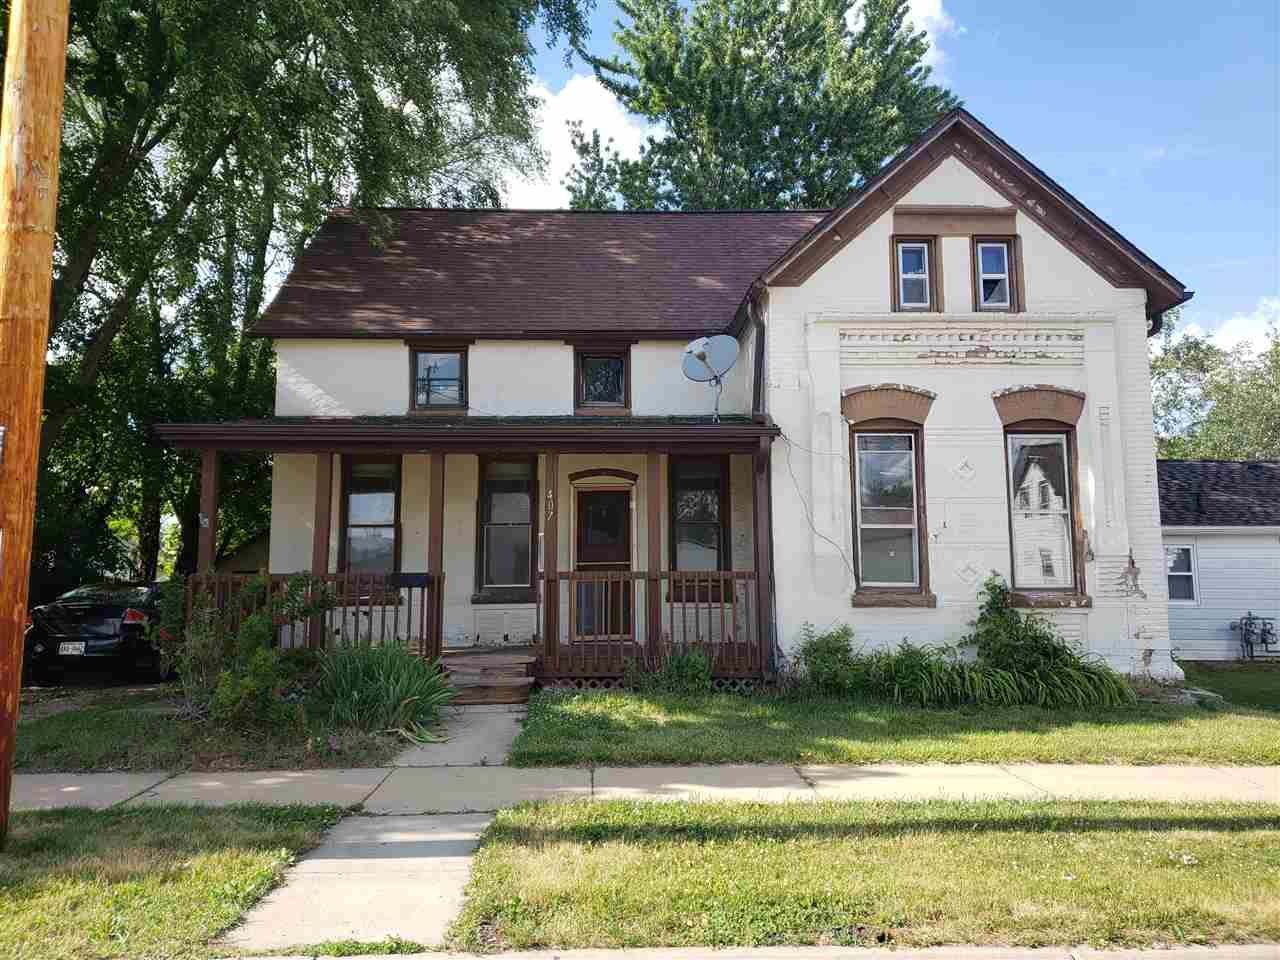 407 W Benton St, Tomah, WI 54660 - #: 1914605